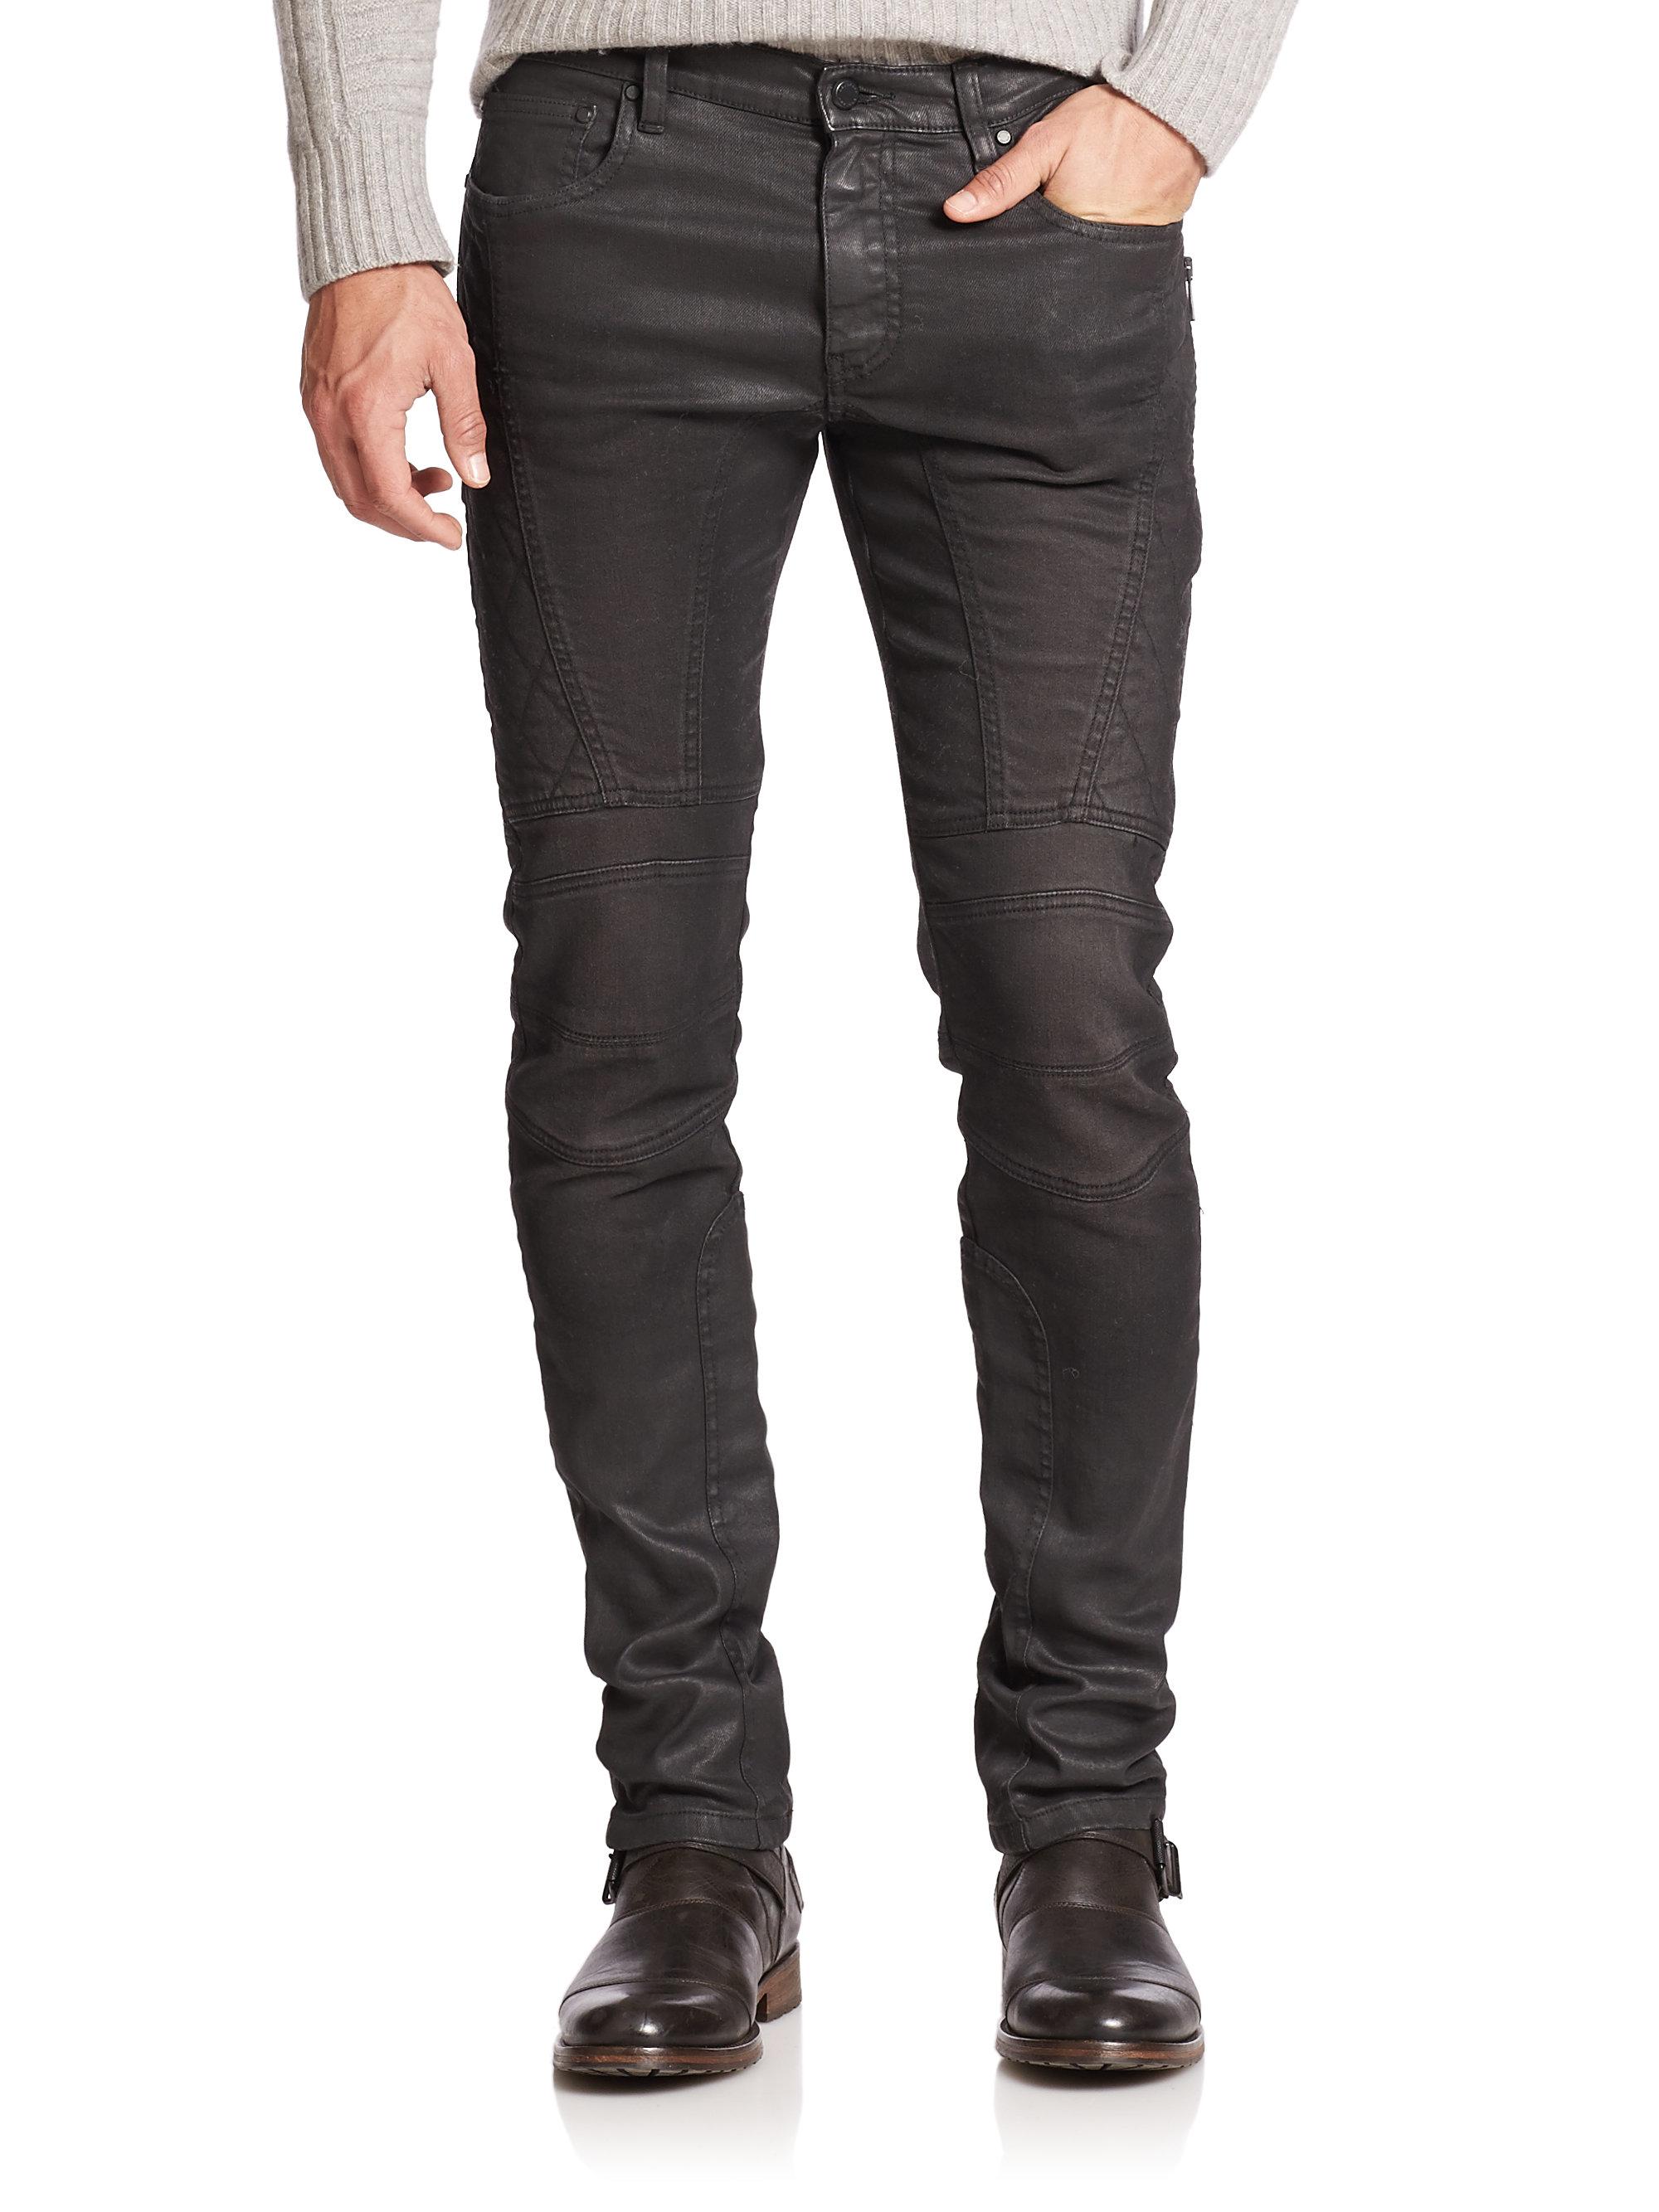 Lyst - Belstaff Eversely Slim-fit Moto Jeans in Black for Men